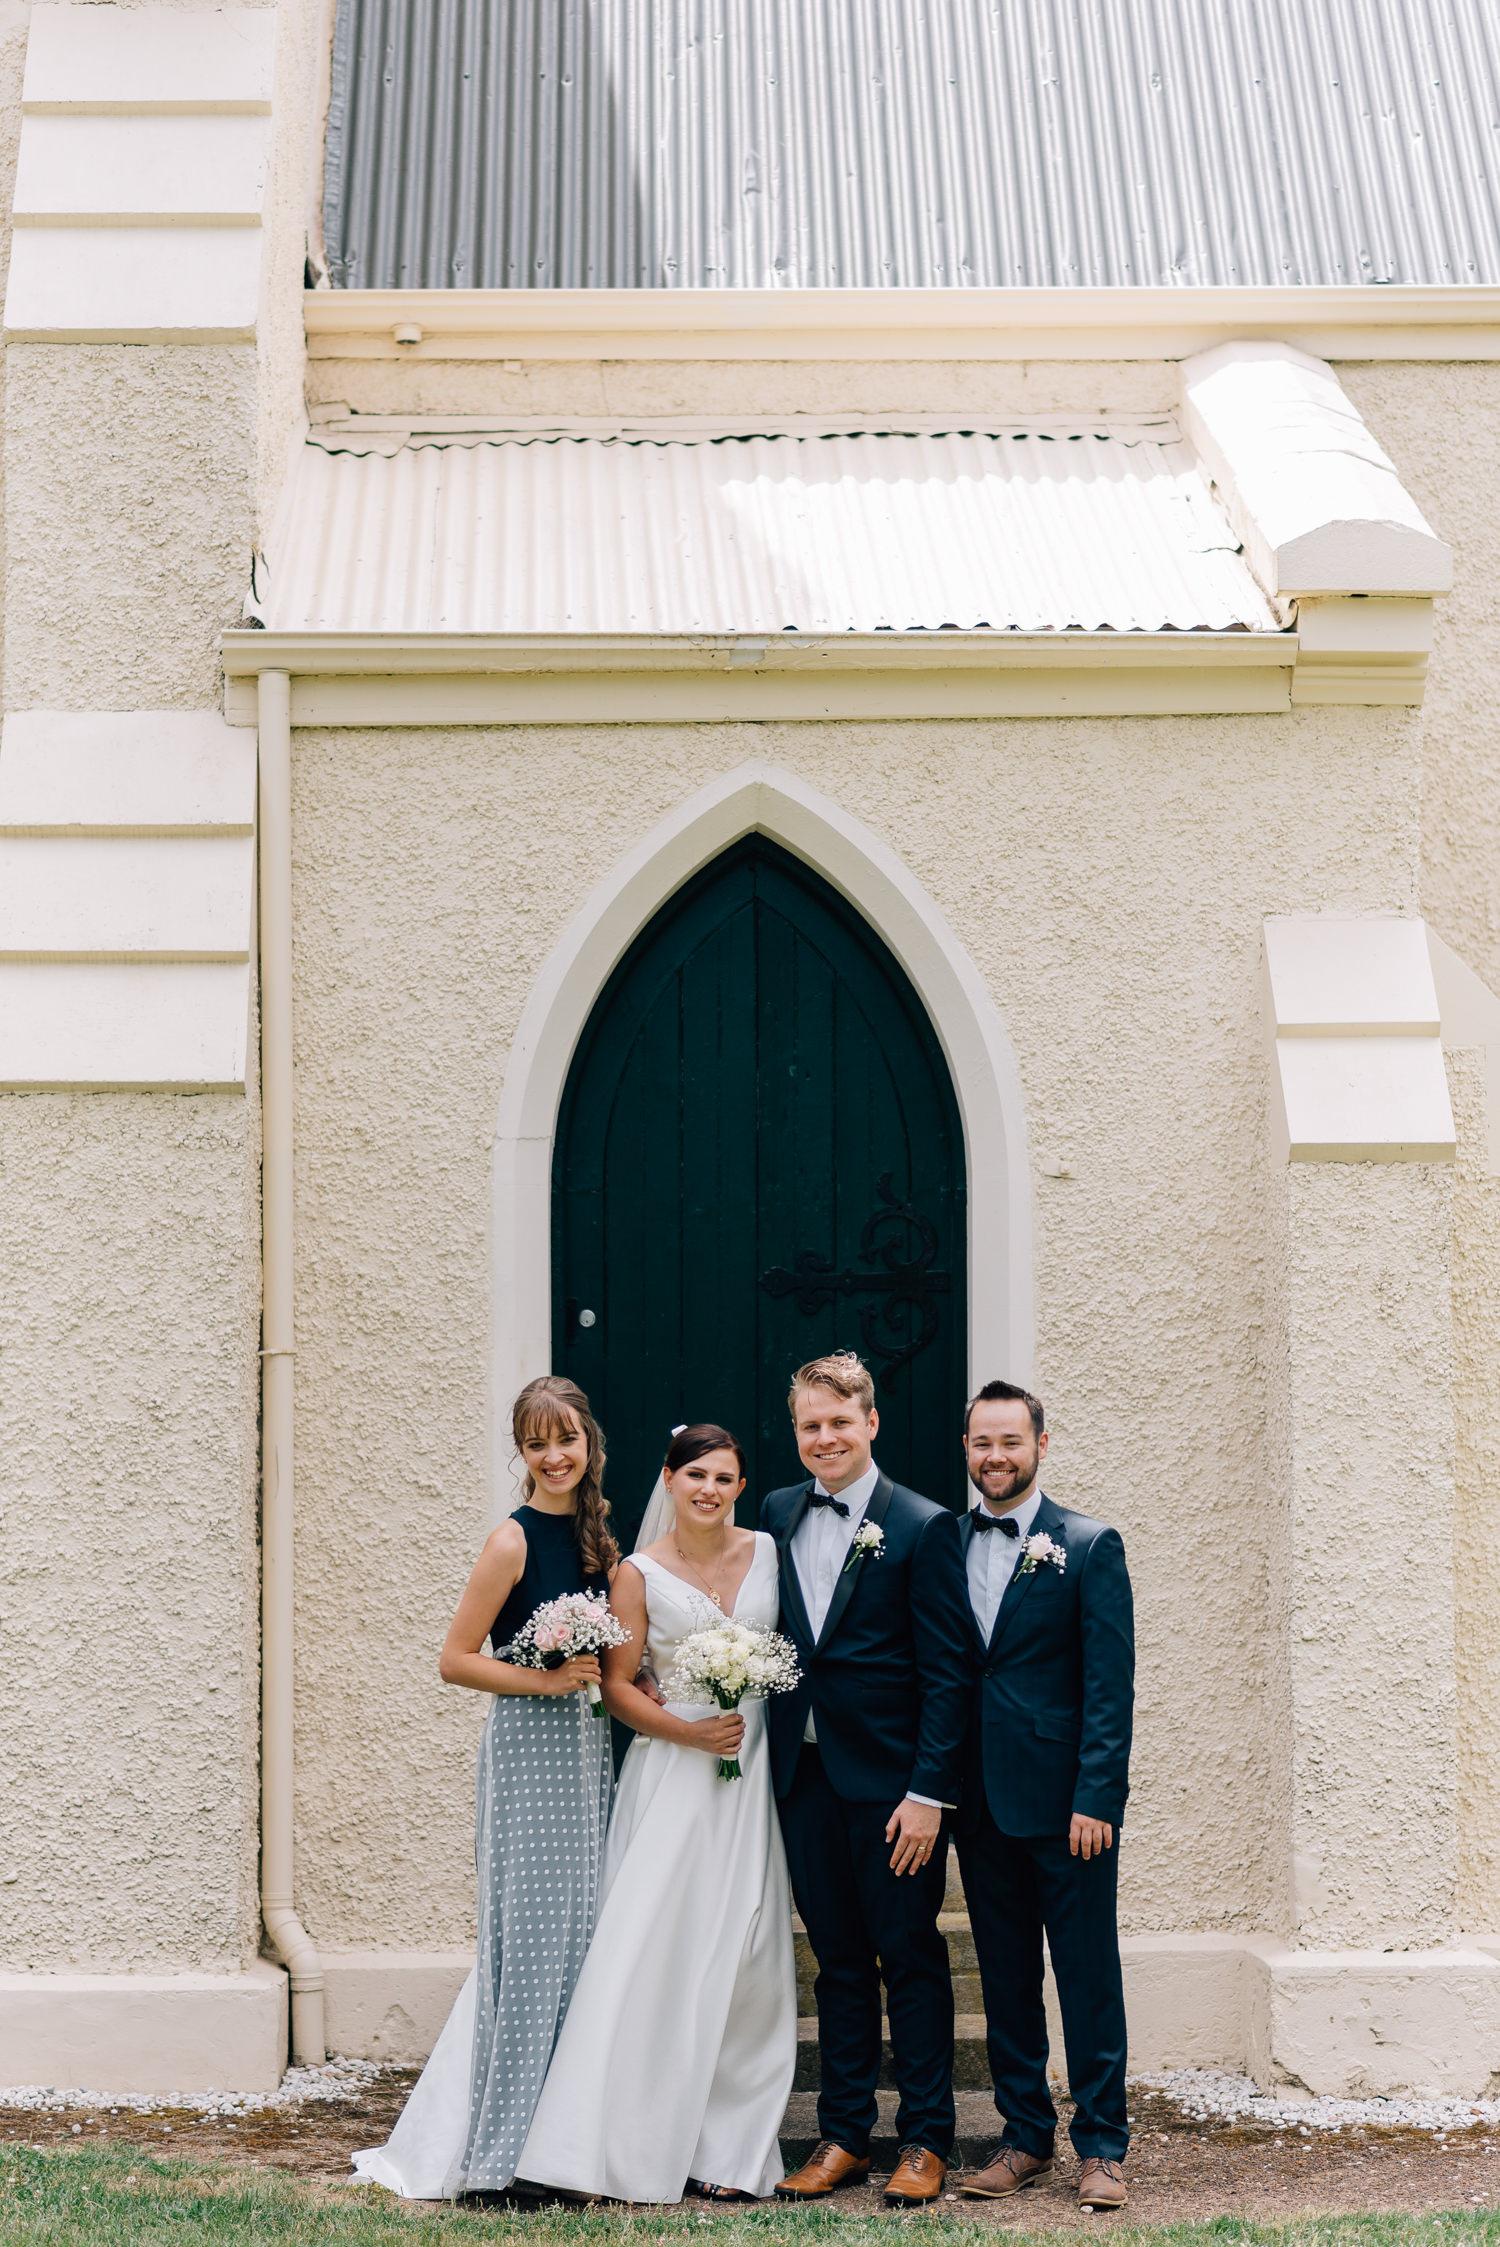 Josef-Chromy-Wedding-Photographer-43.jpg